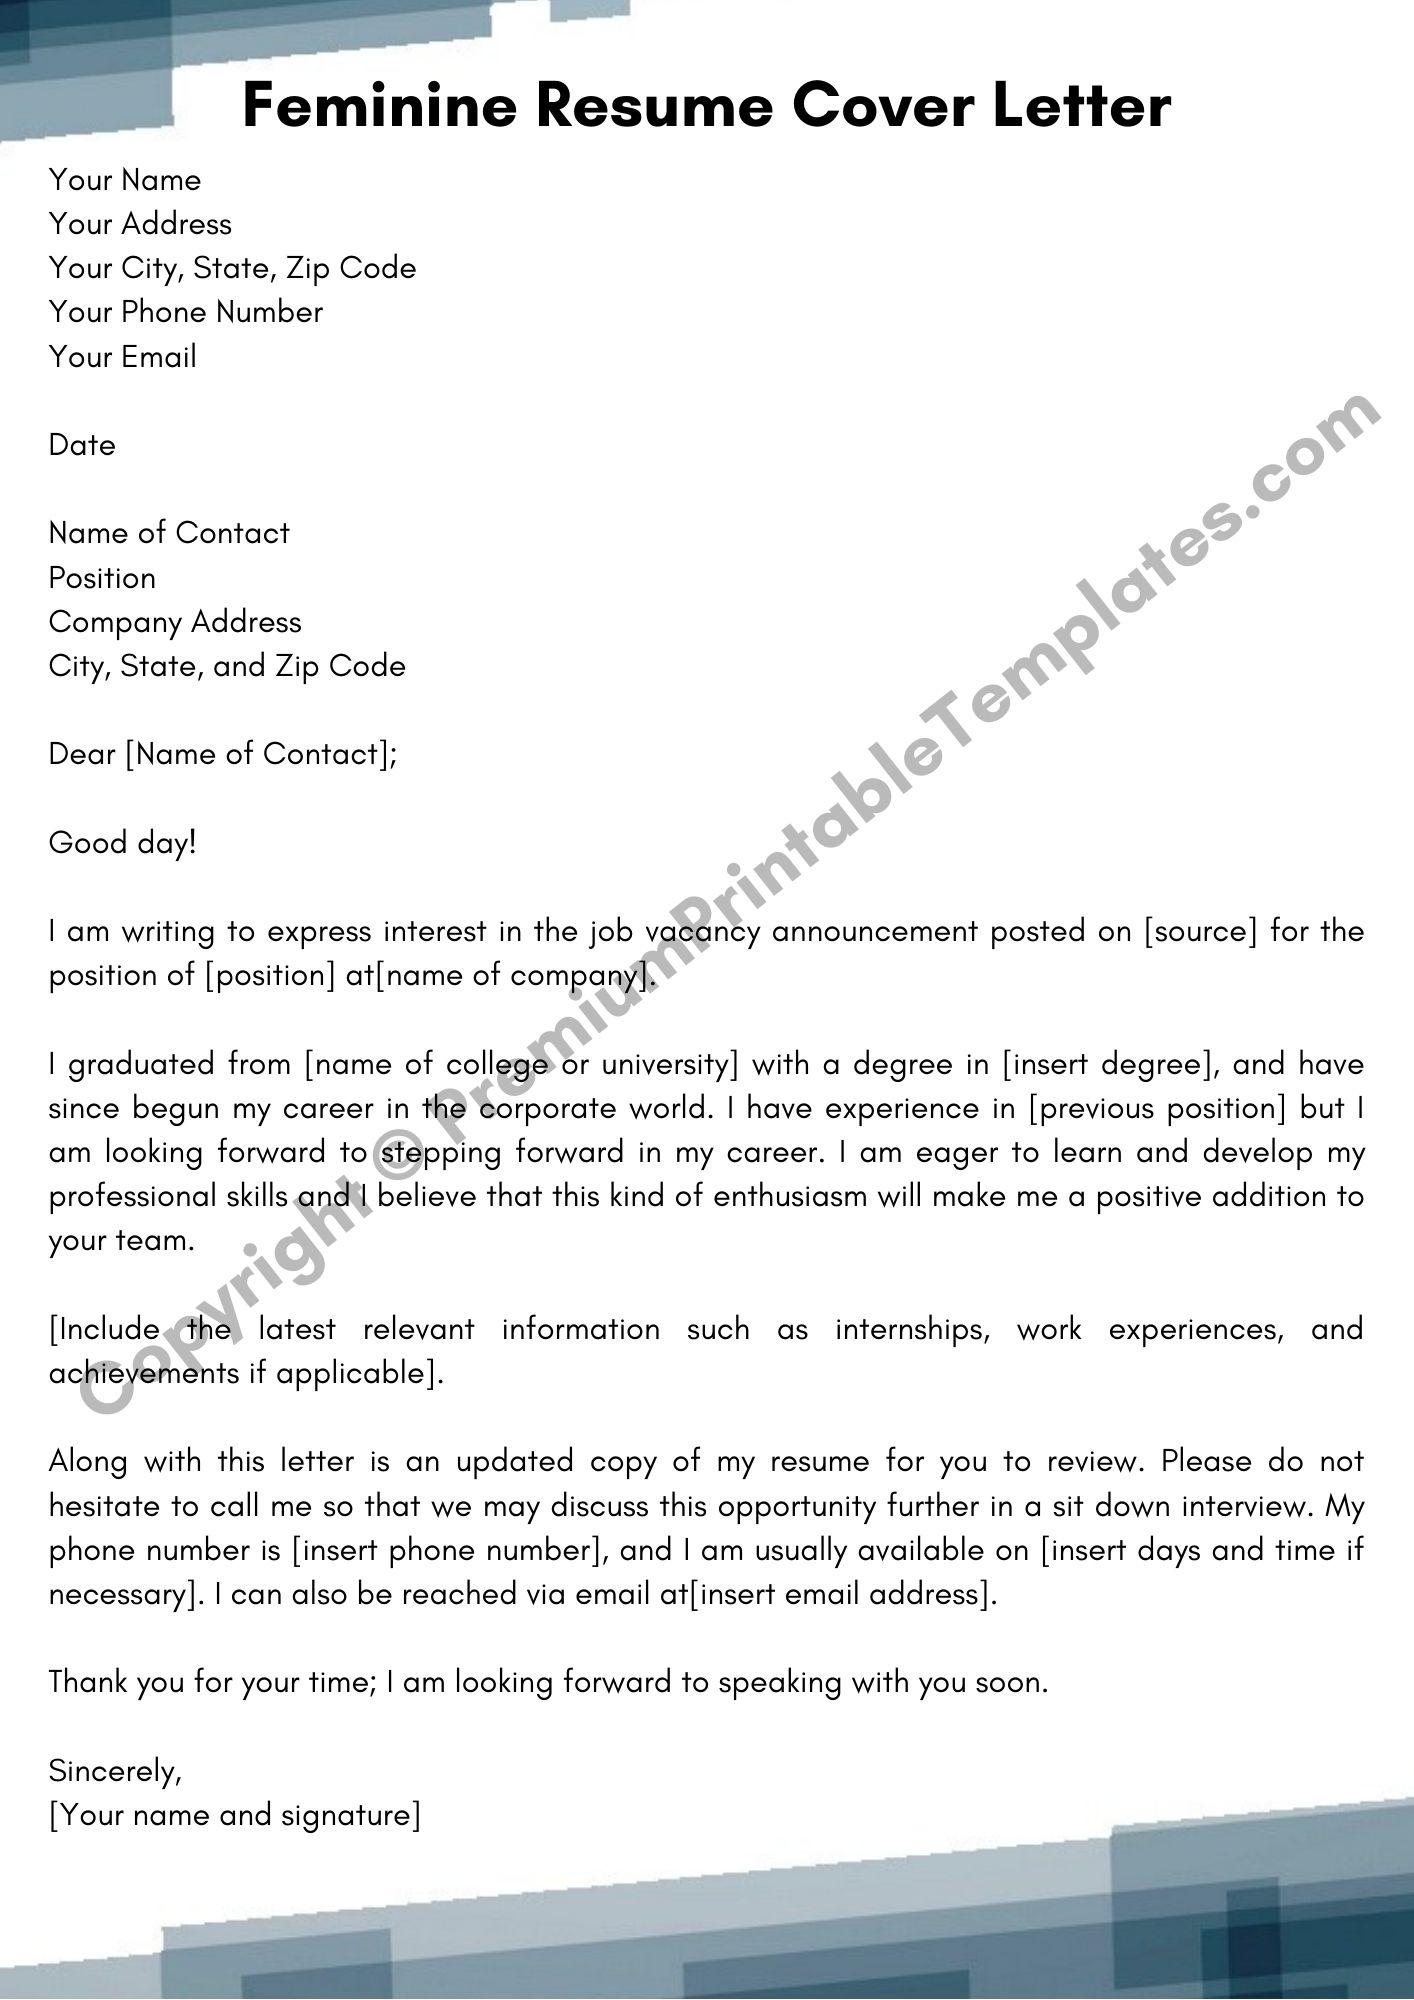 Feminine Resume Cover Letter Template Pack Of 5 Premium Printable Templates